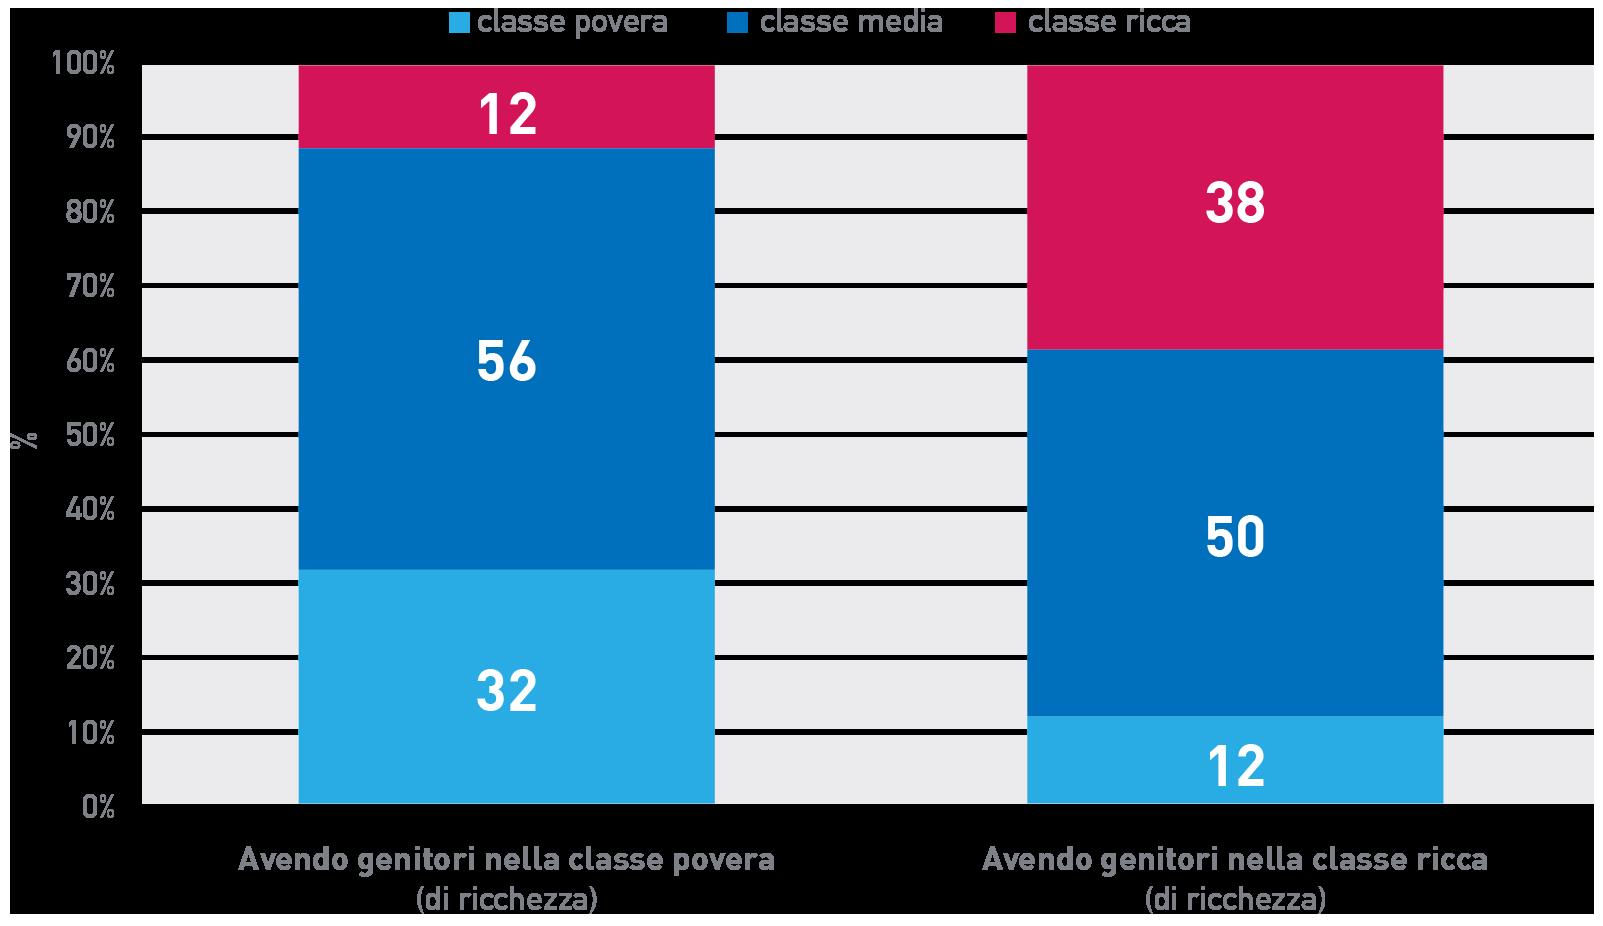 Figura 10 Mobilità intergenerazionale di ricchezza